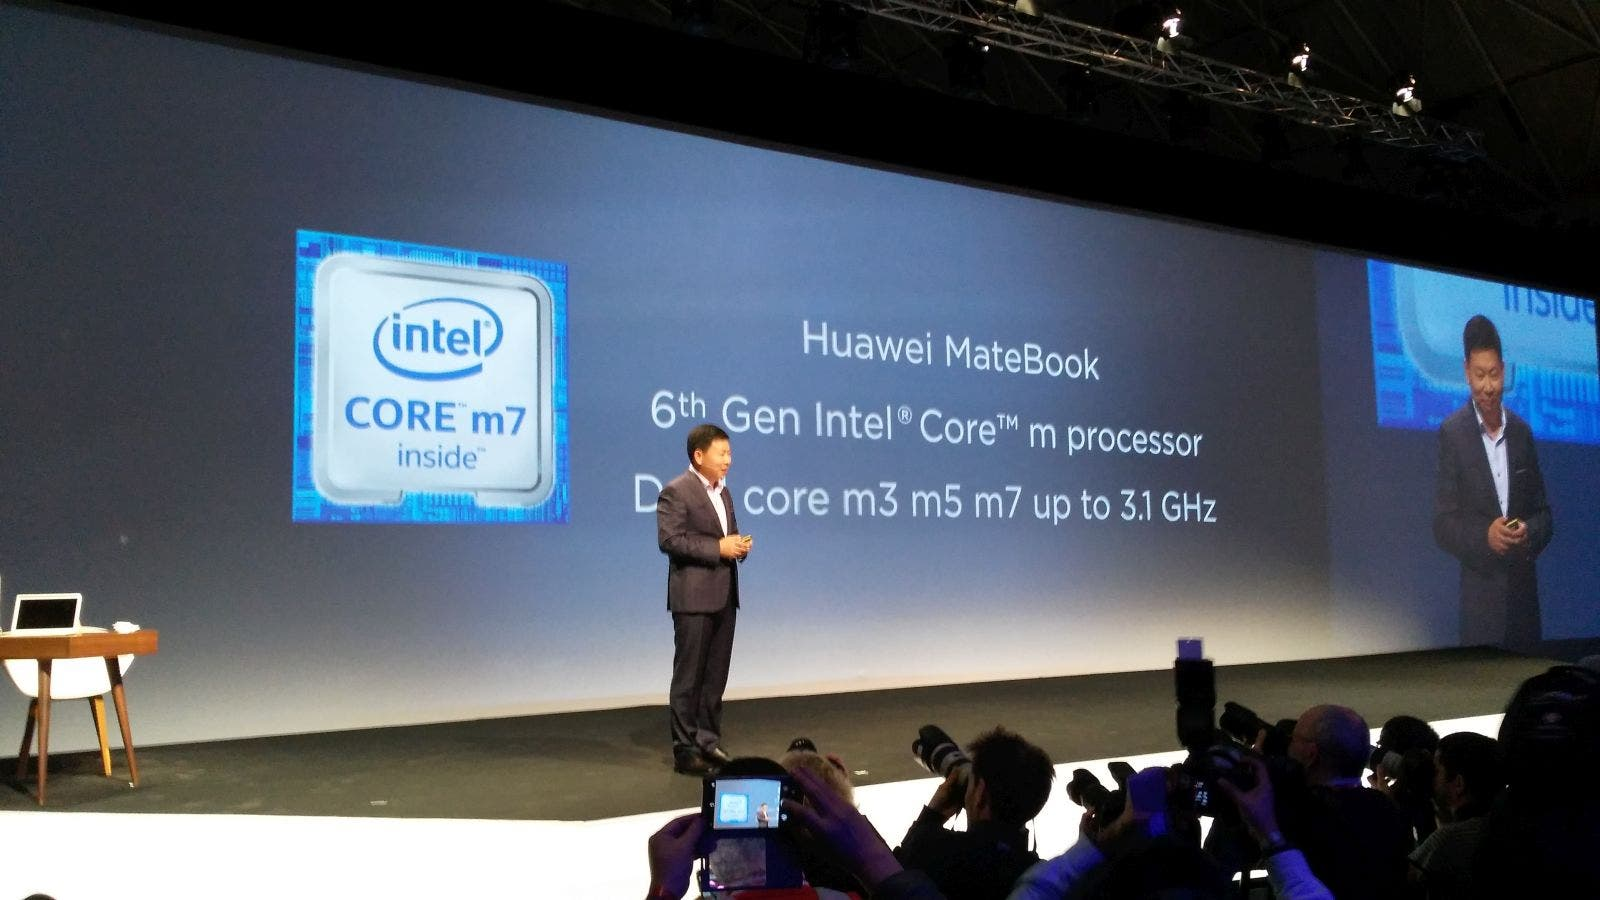 Huawei MateBook 05